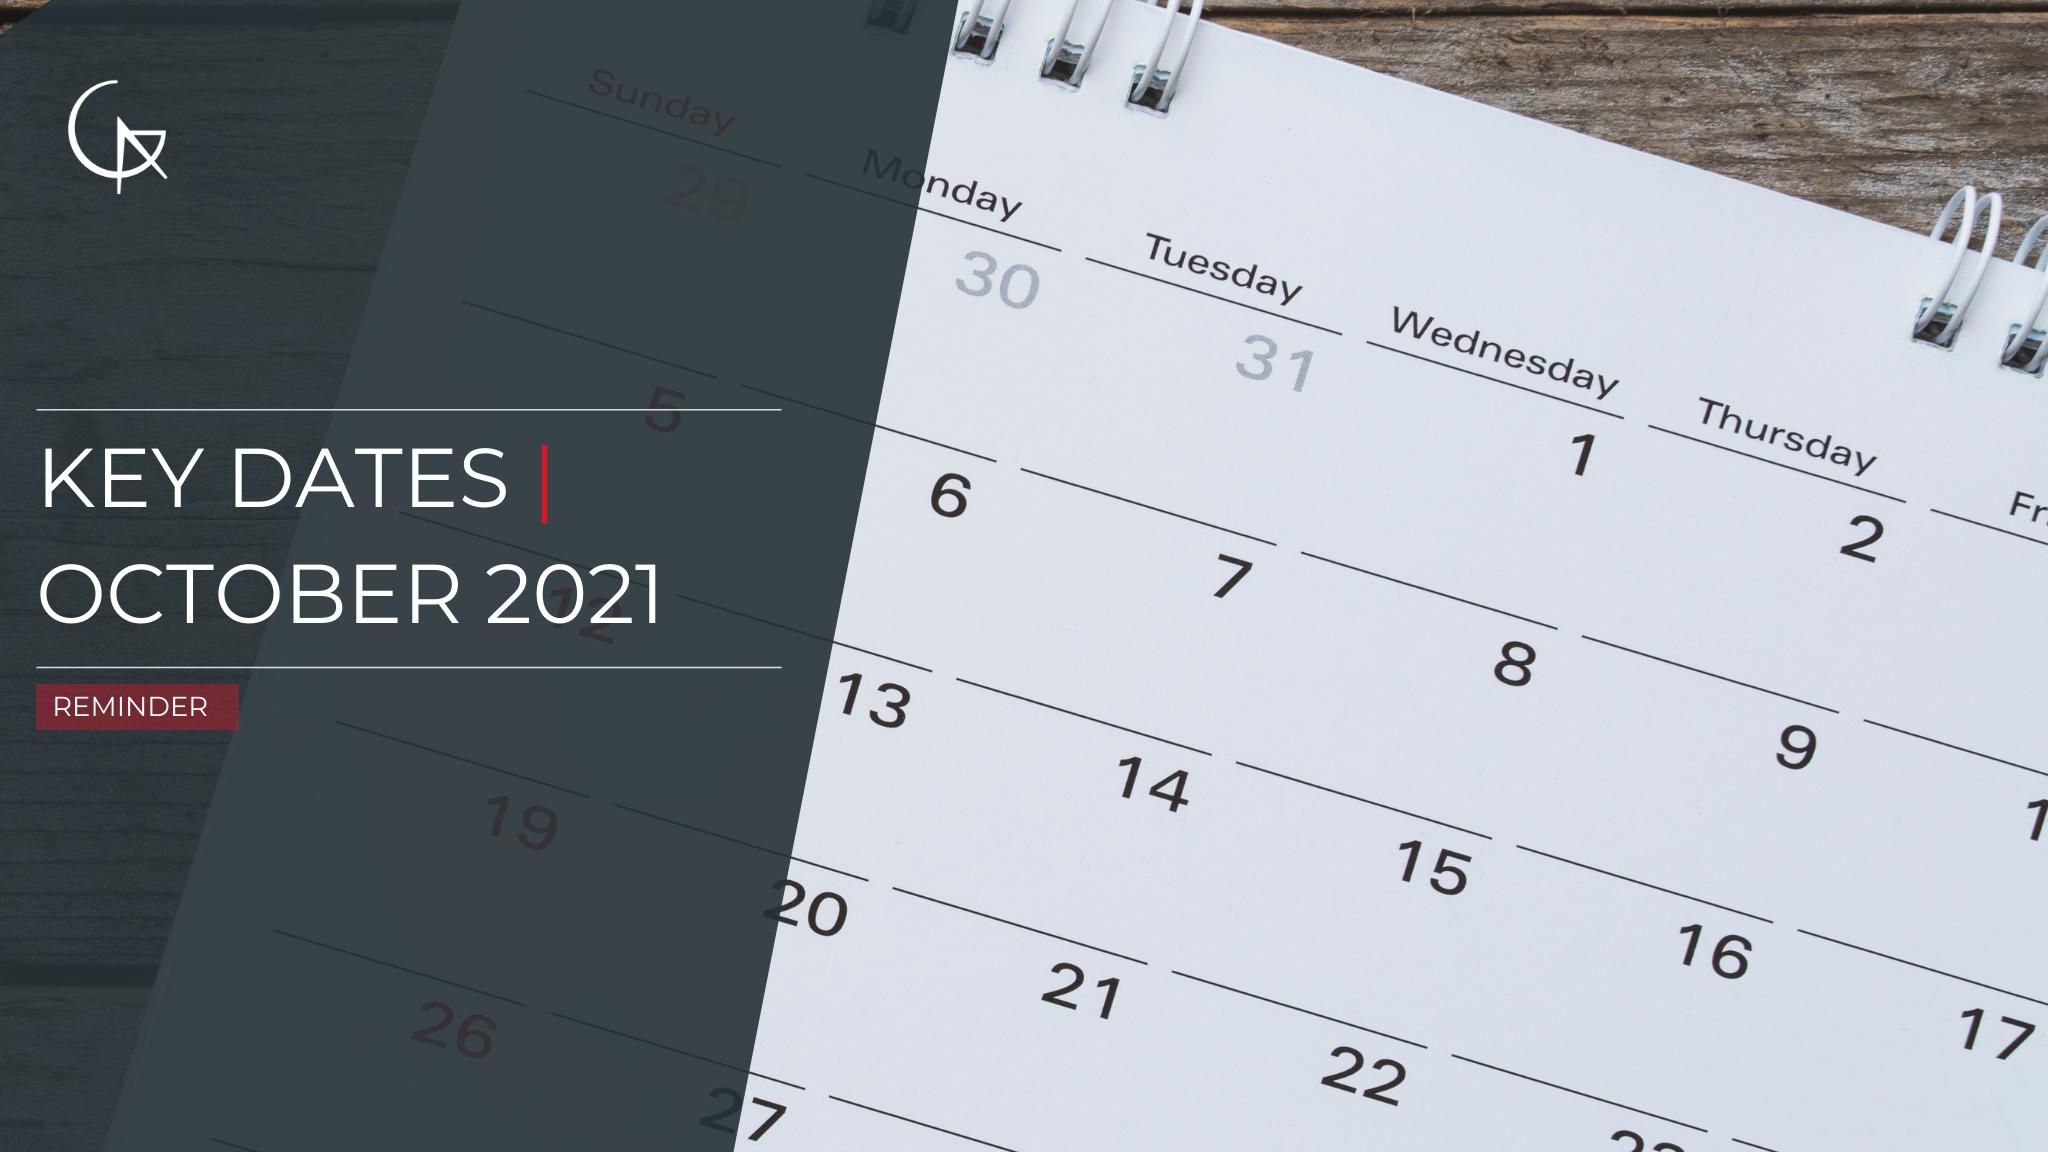 Key Due Dates - October 2021